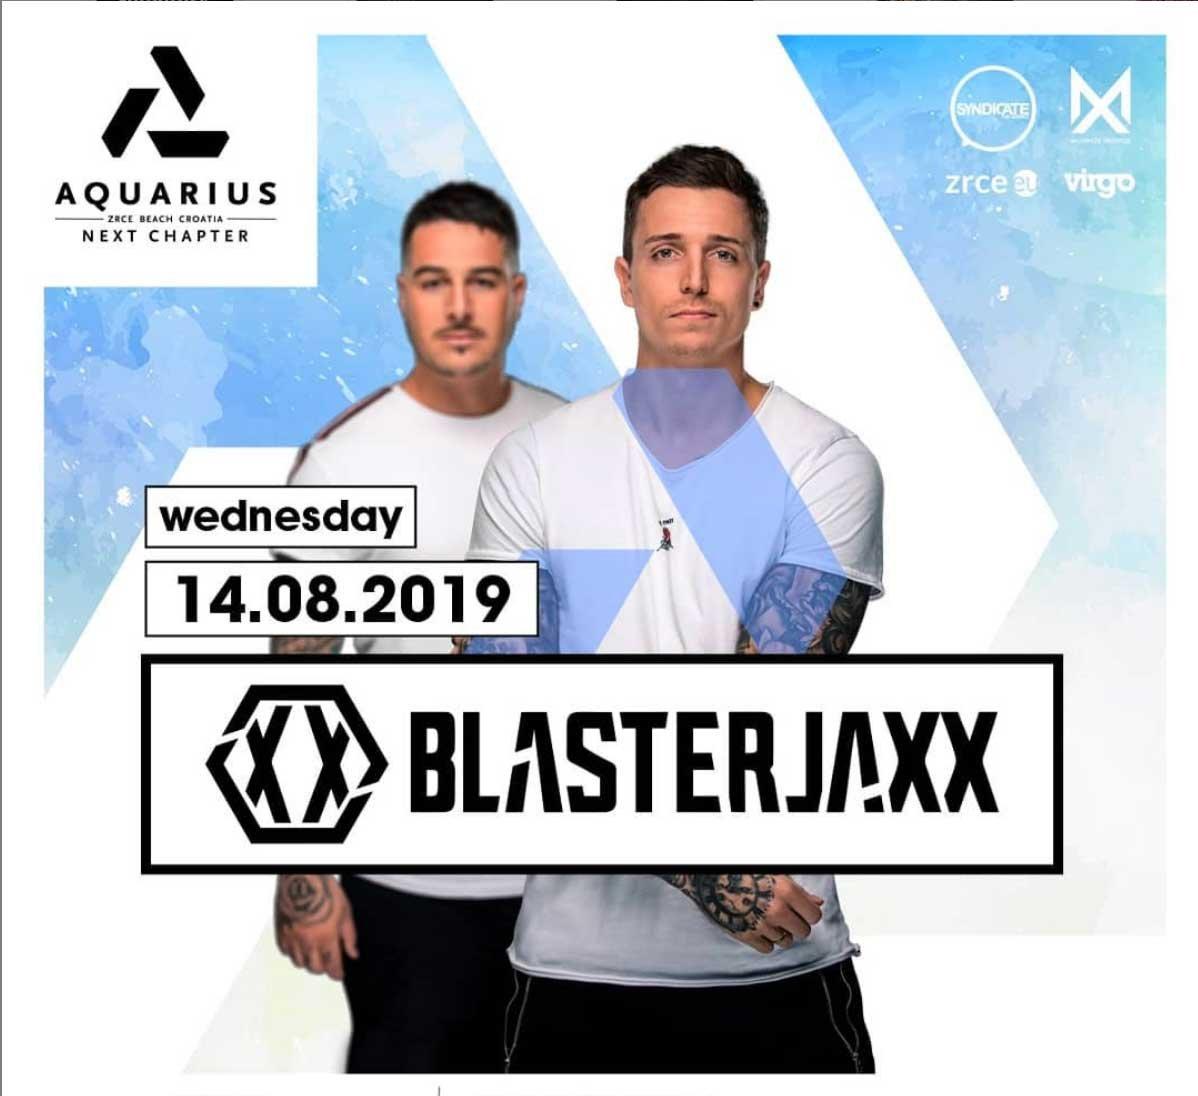 Blasterjaxx 14.8. Aquarius Zrce